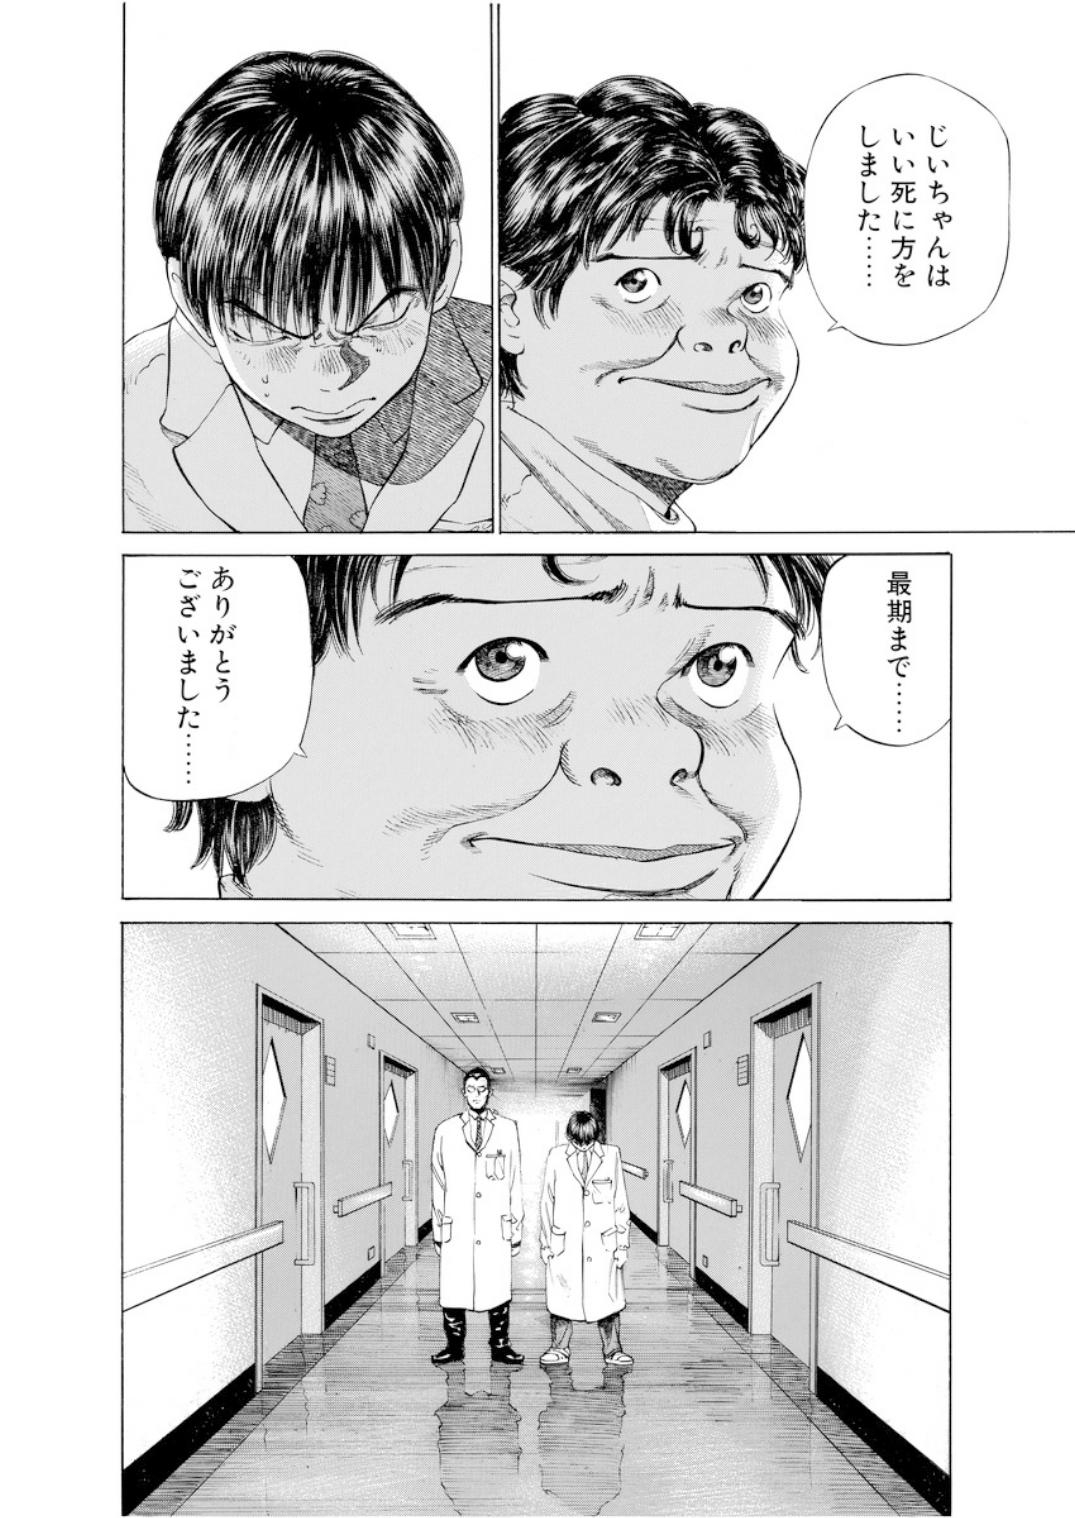 001bj_page-0140.jpg